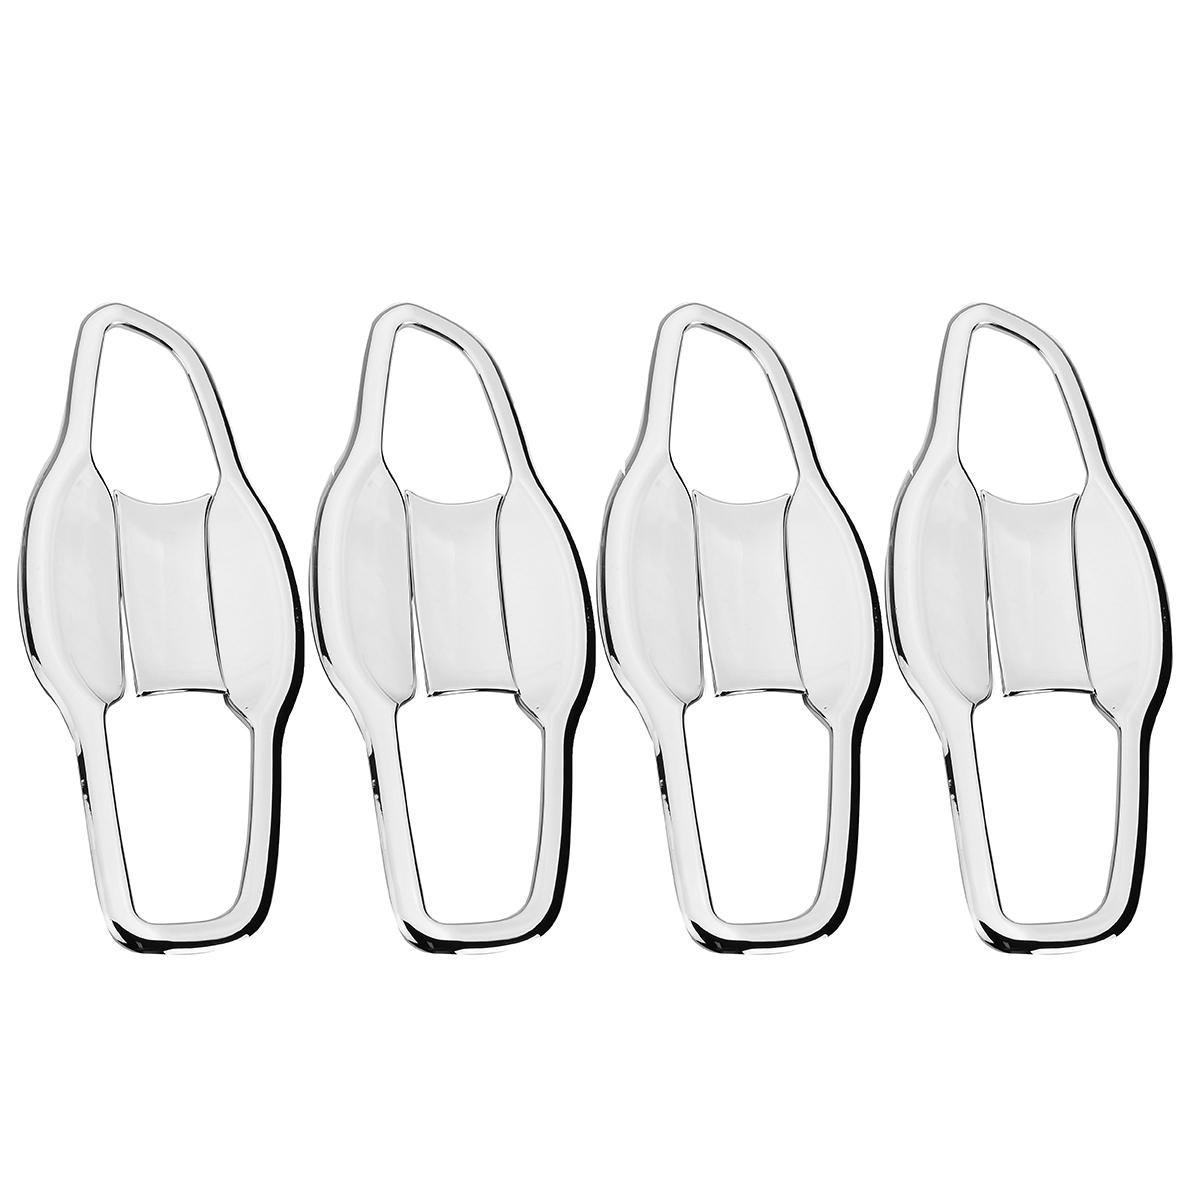 Door Handles Bowl Trim Molding For Honda CRV Accessories 201…